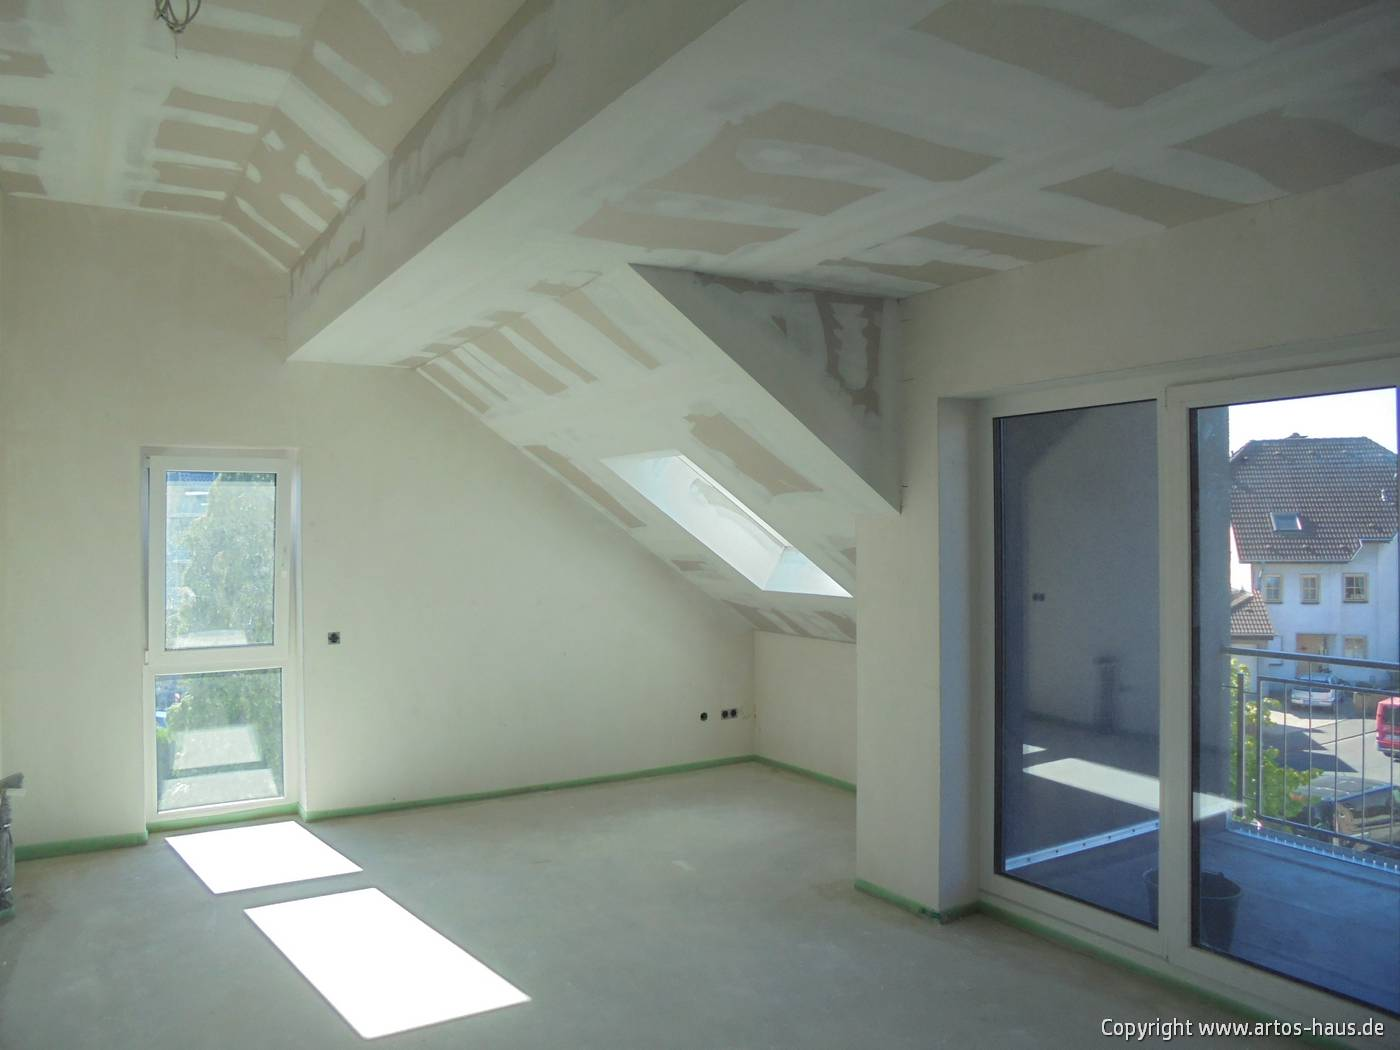 Trockenbauarbeiten Mehrfamilienhaus www.artos-haus.de Bild 5